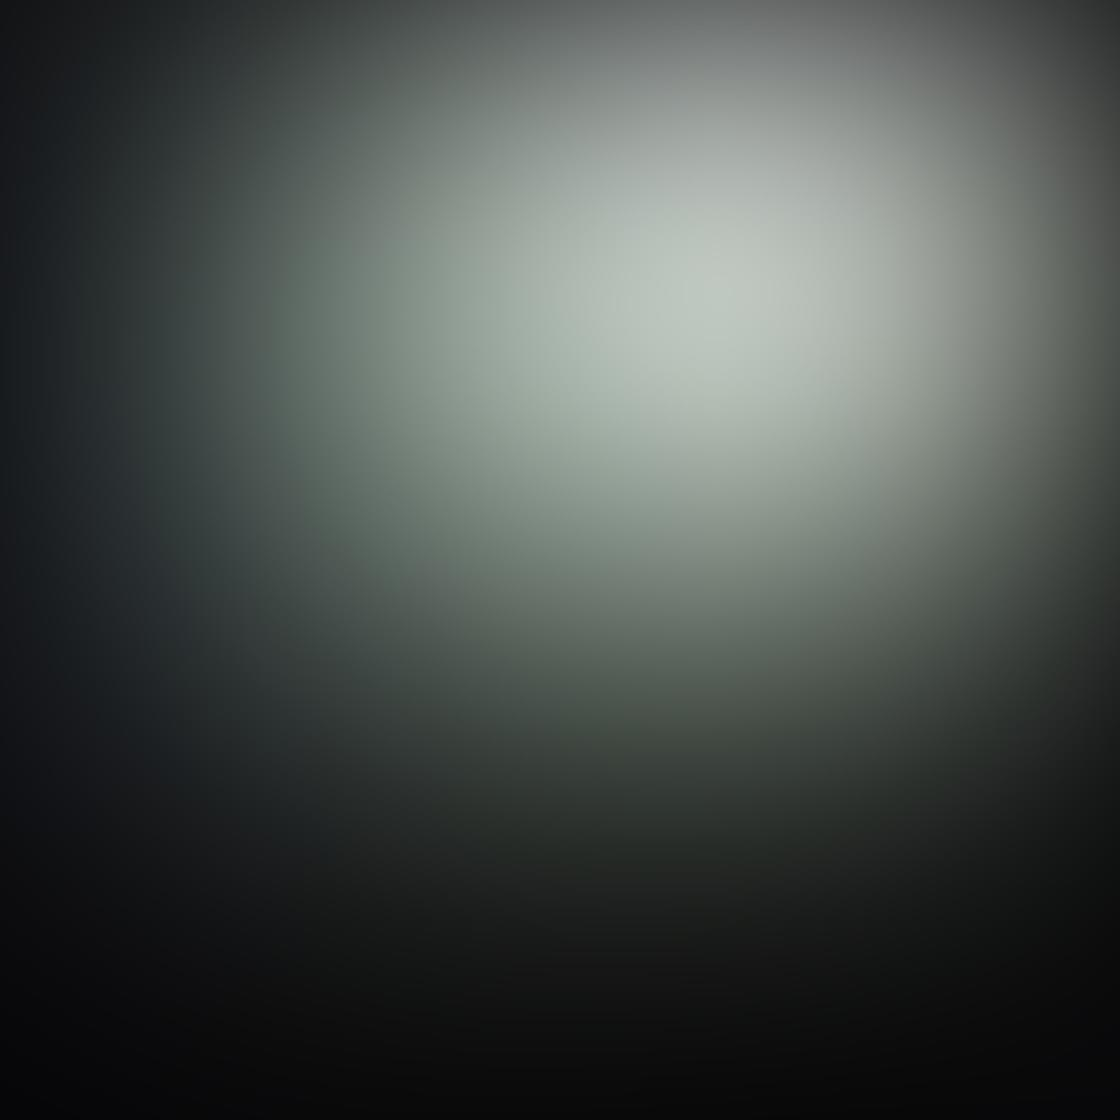 iPhone Sun Photo 24